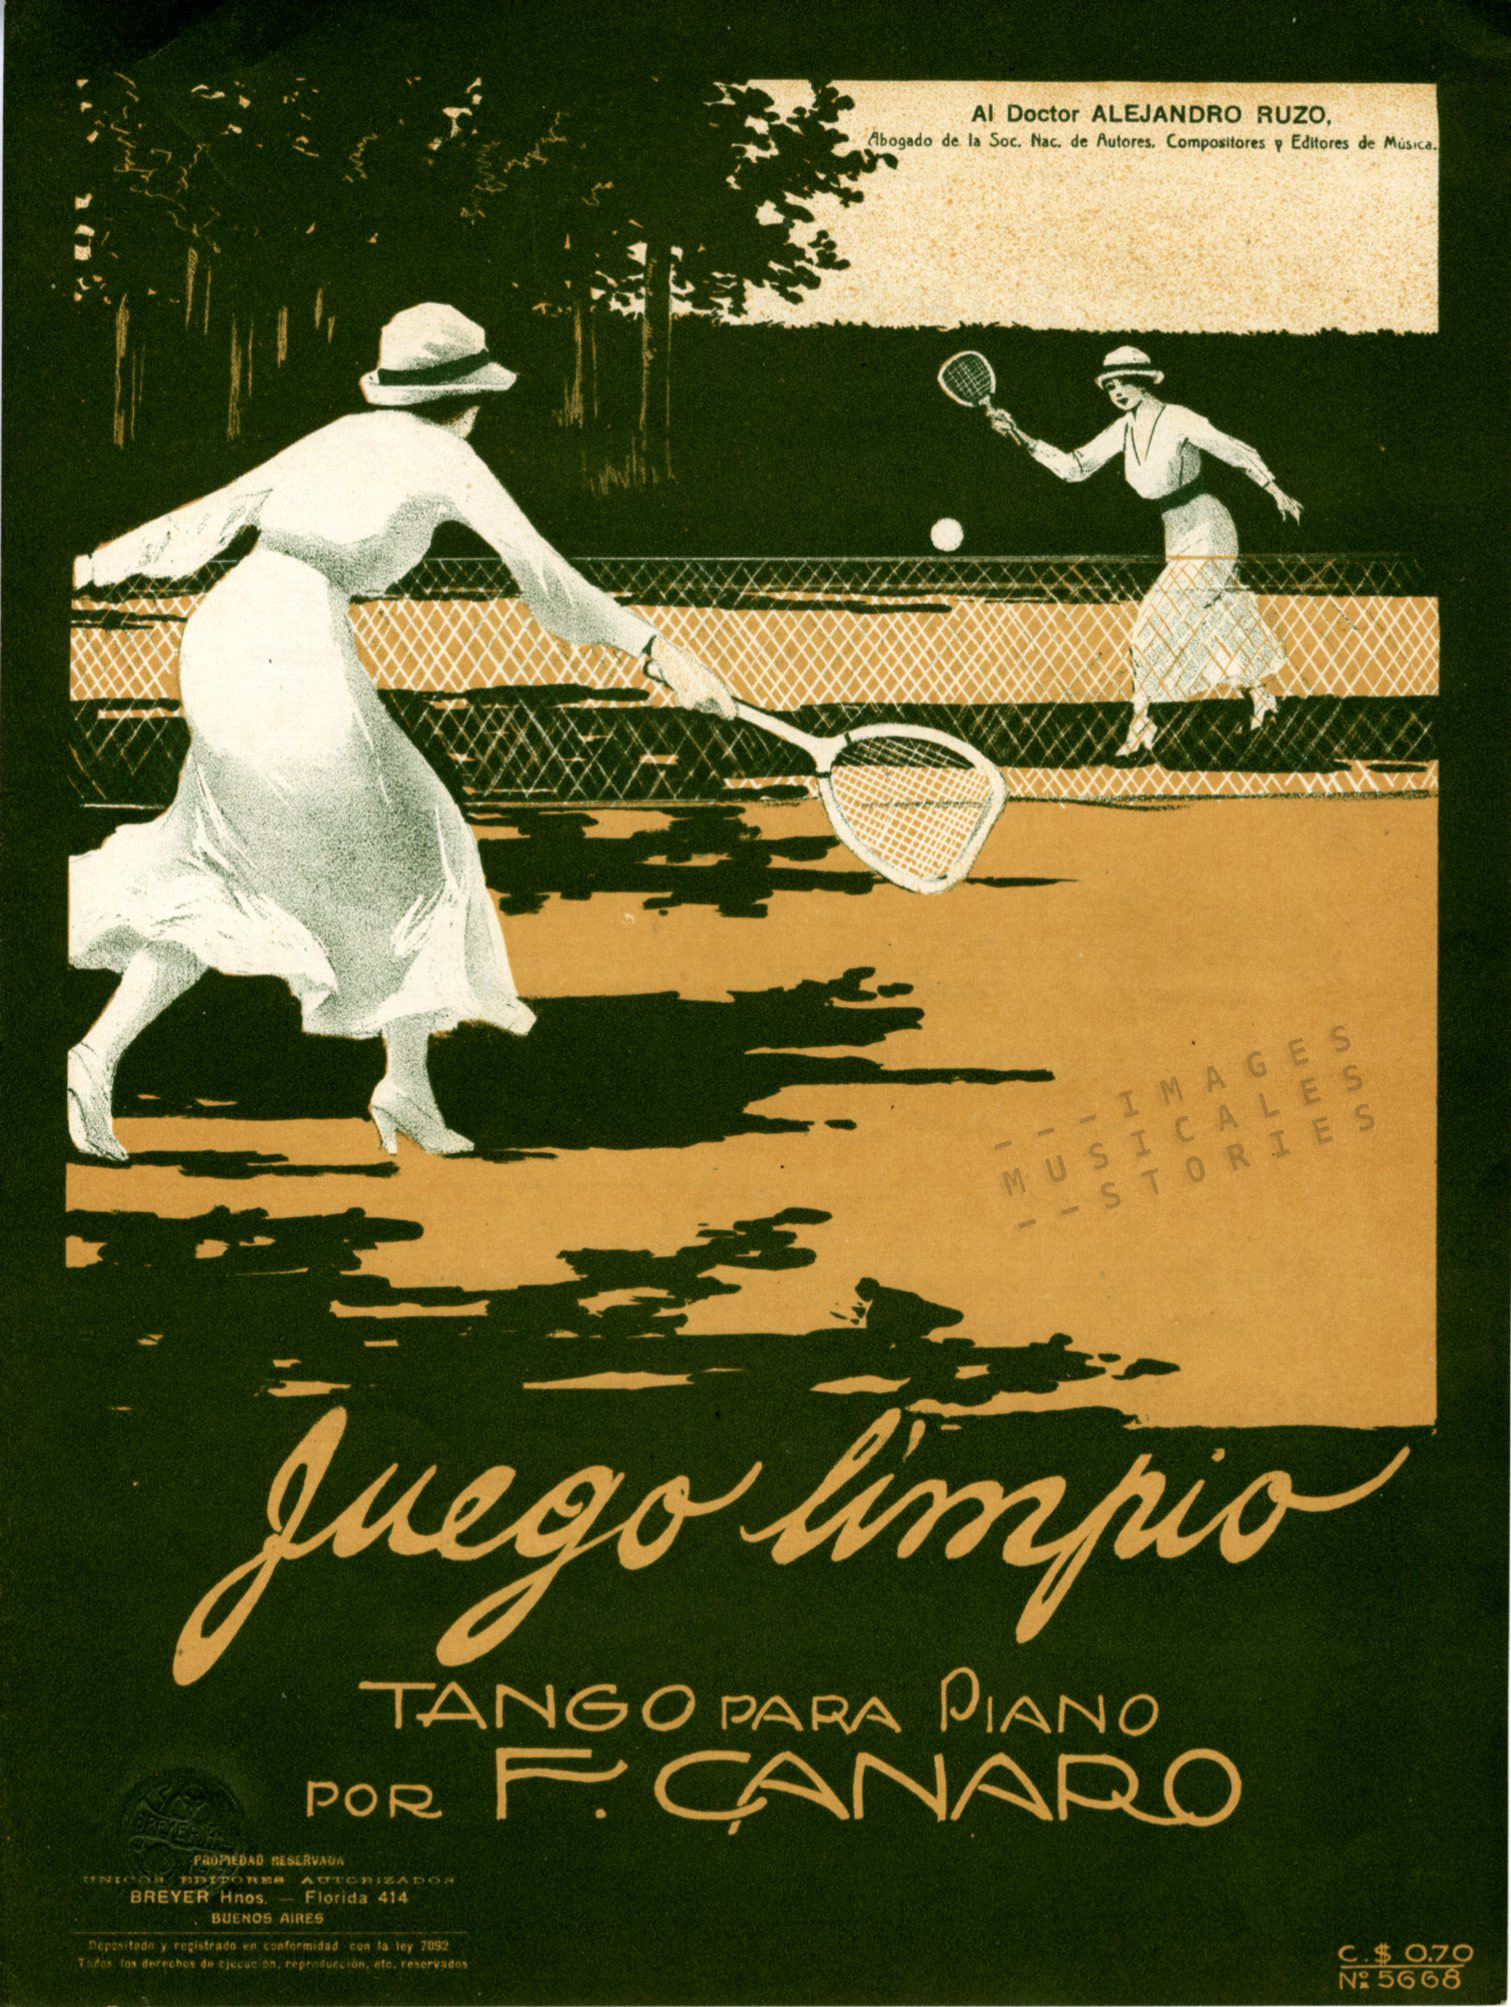 tennis tango